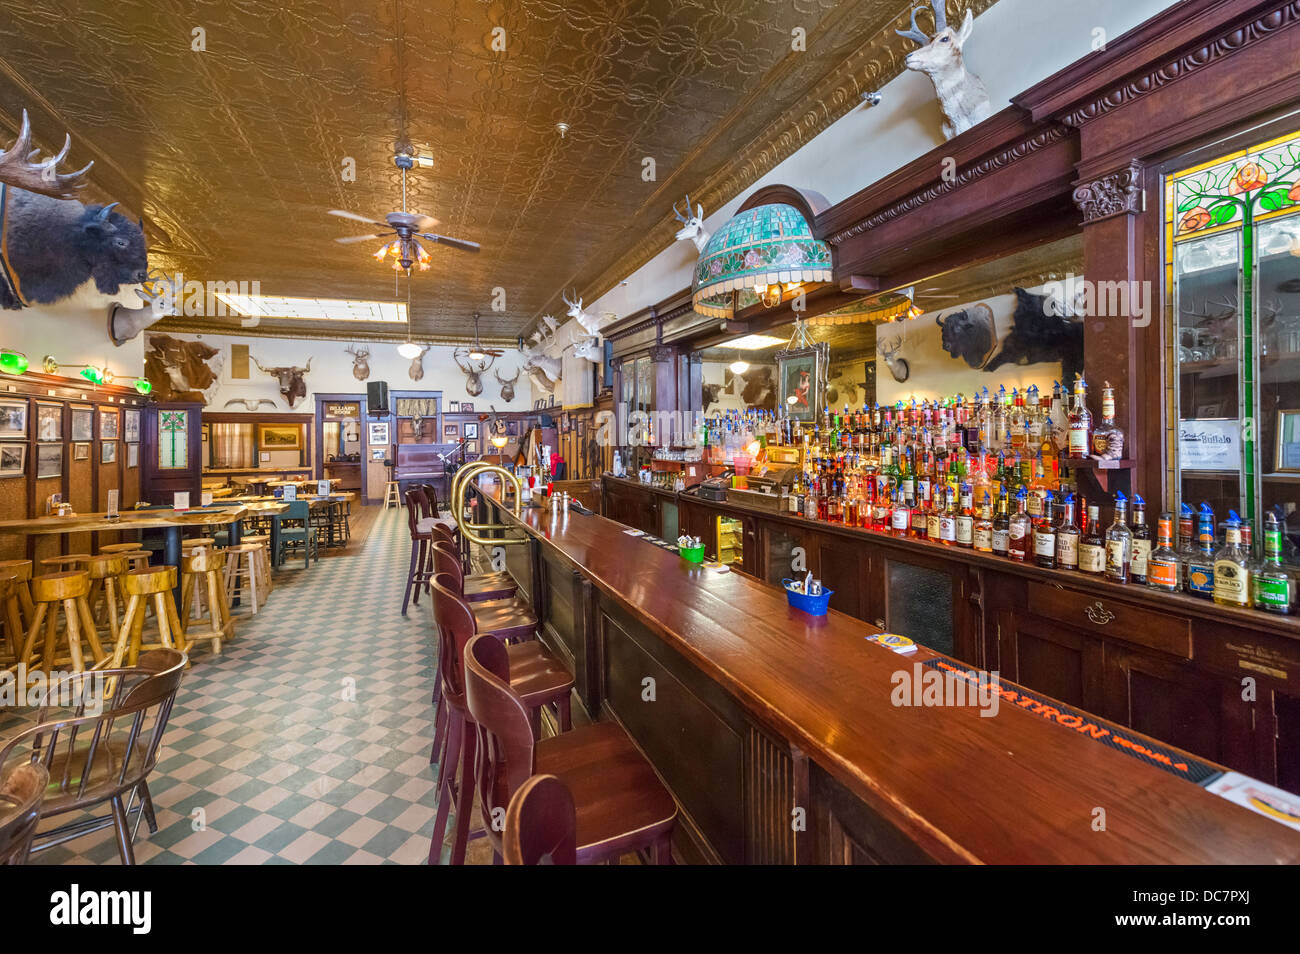 The saloon bar of the historic Occidental Hotel, Main Street, Buffalo, Wyoming, USA - Stock Image